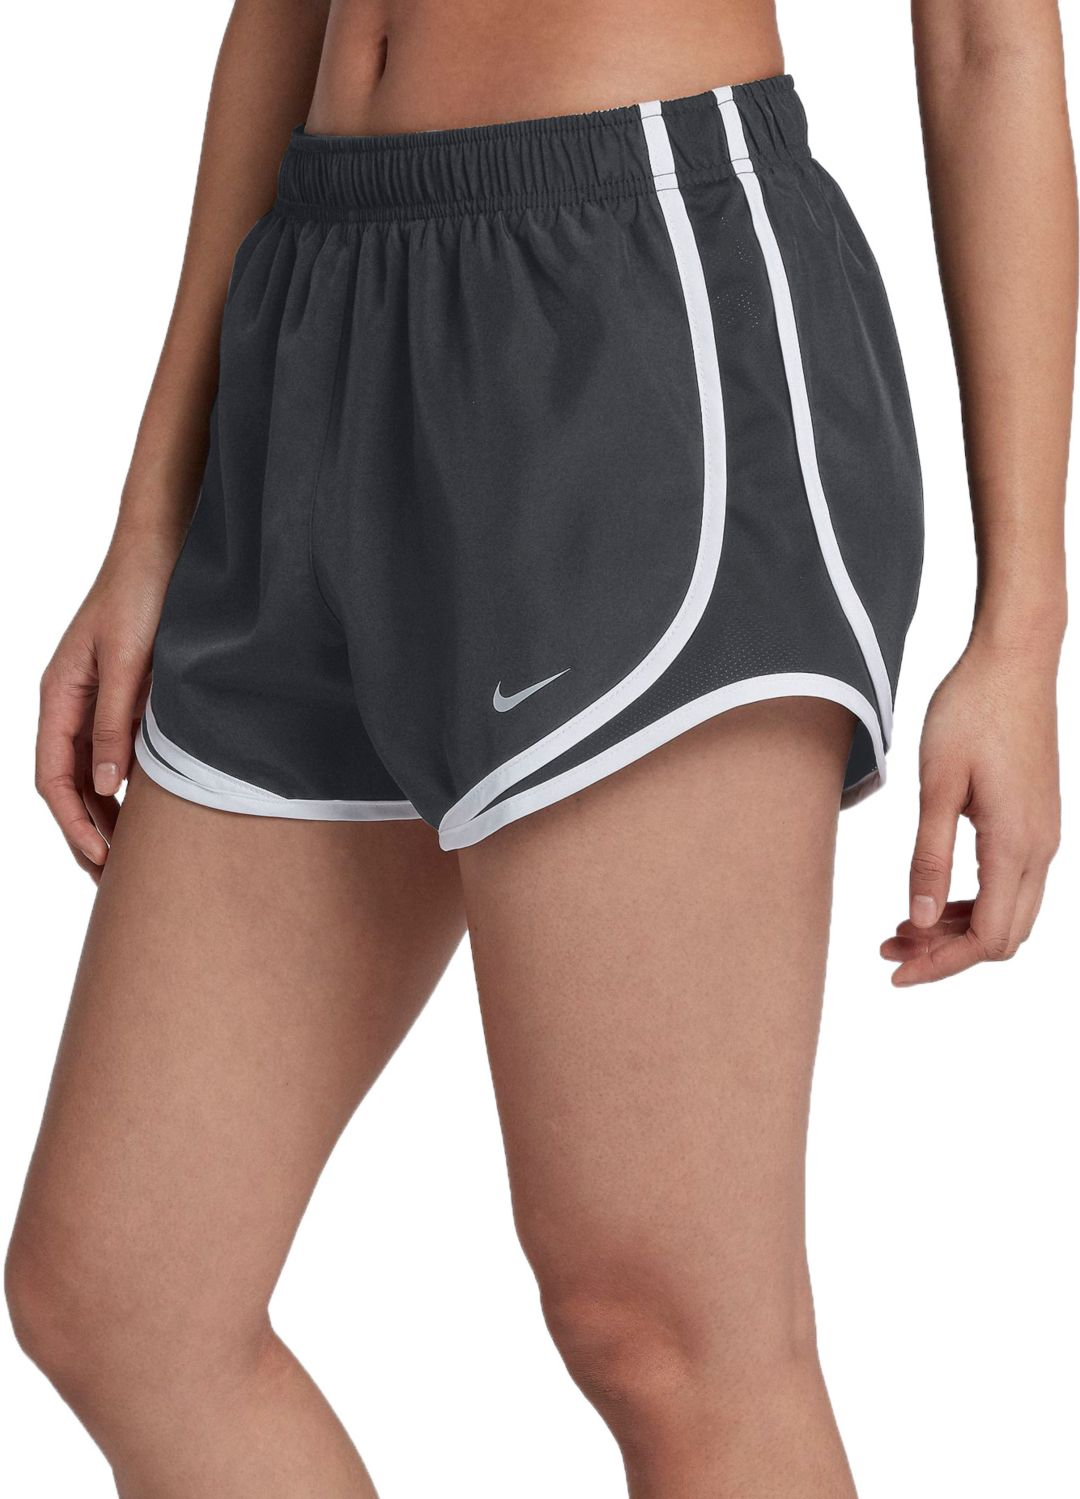 9dc47dbb4 Nike Women's 3'' Dry Tempo Core Running Shorts. noImageFound. Previous